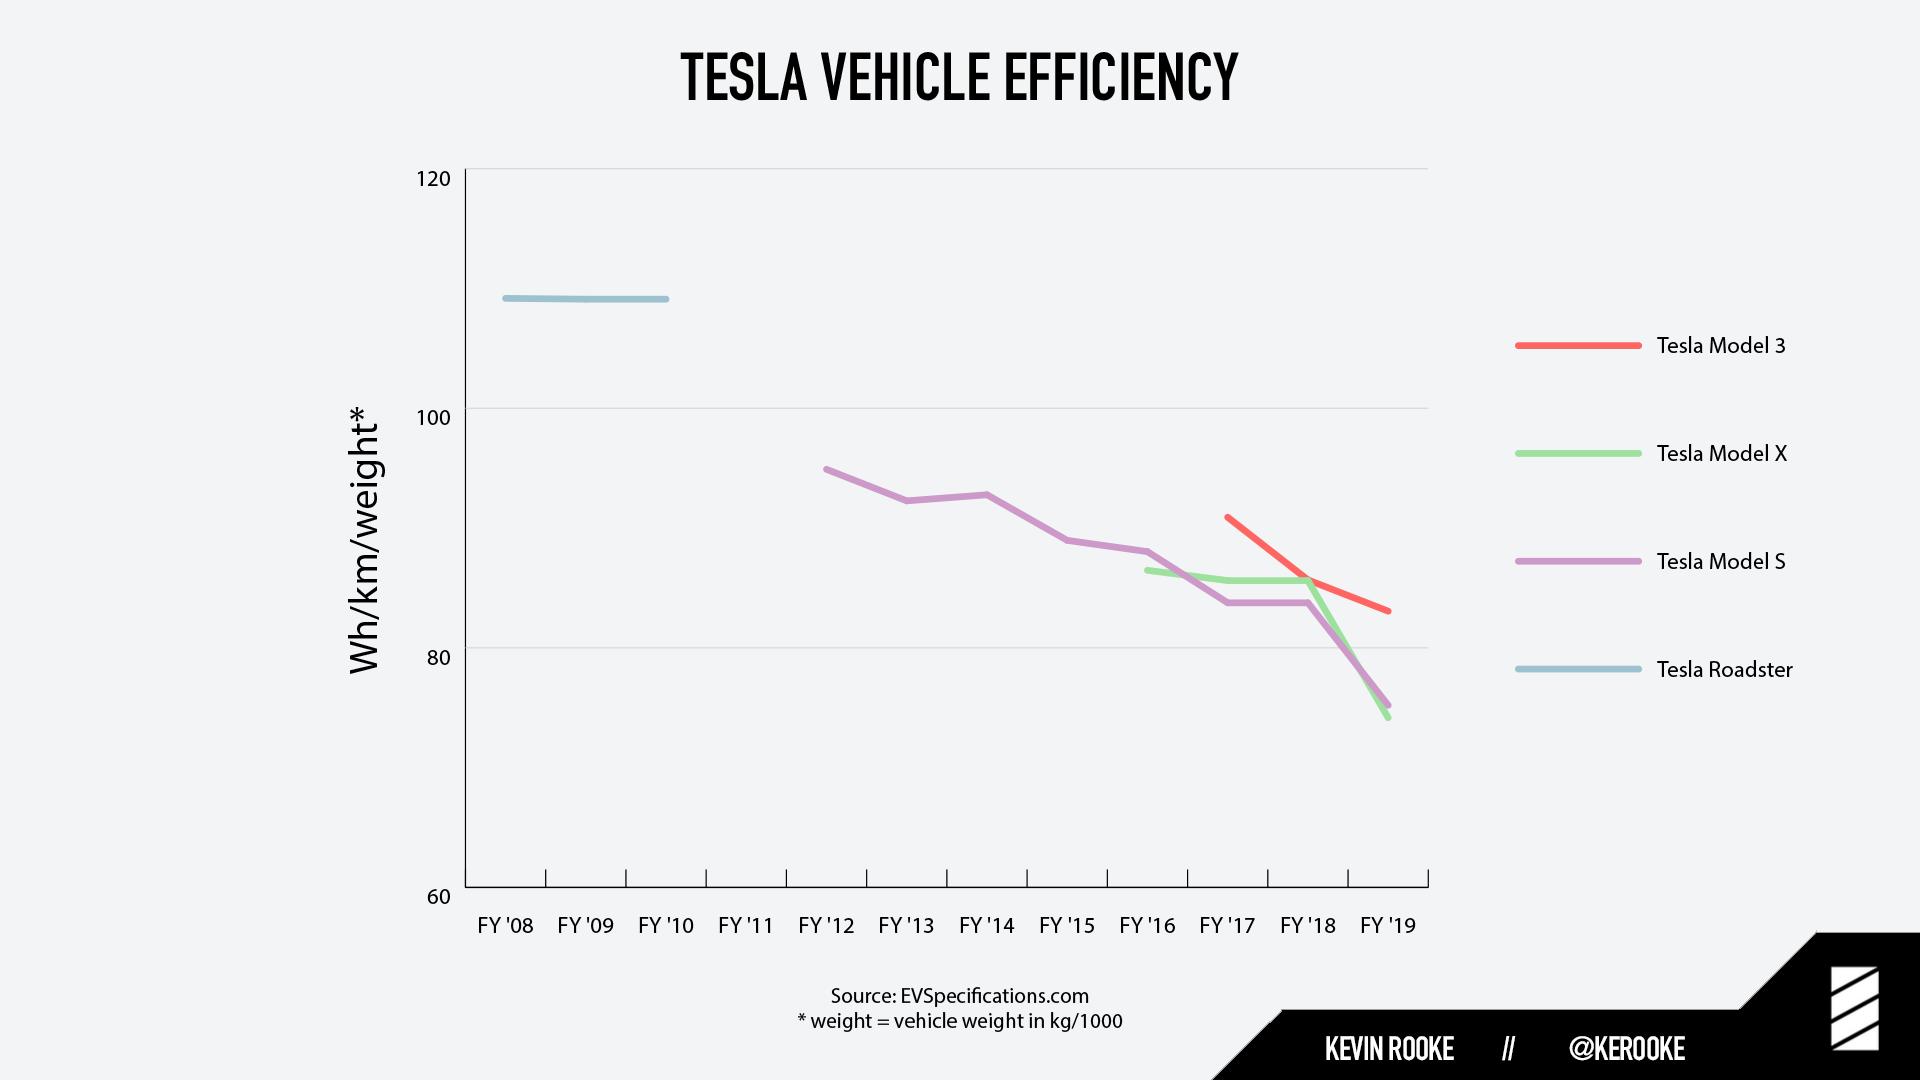 Tesla vehicle efficiency